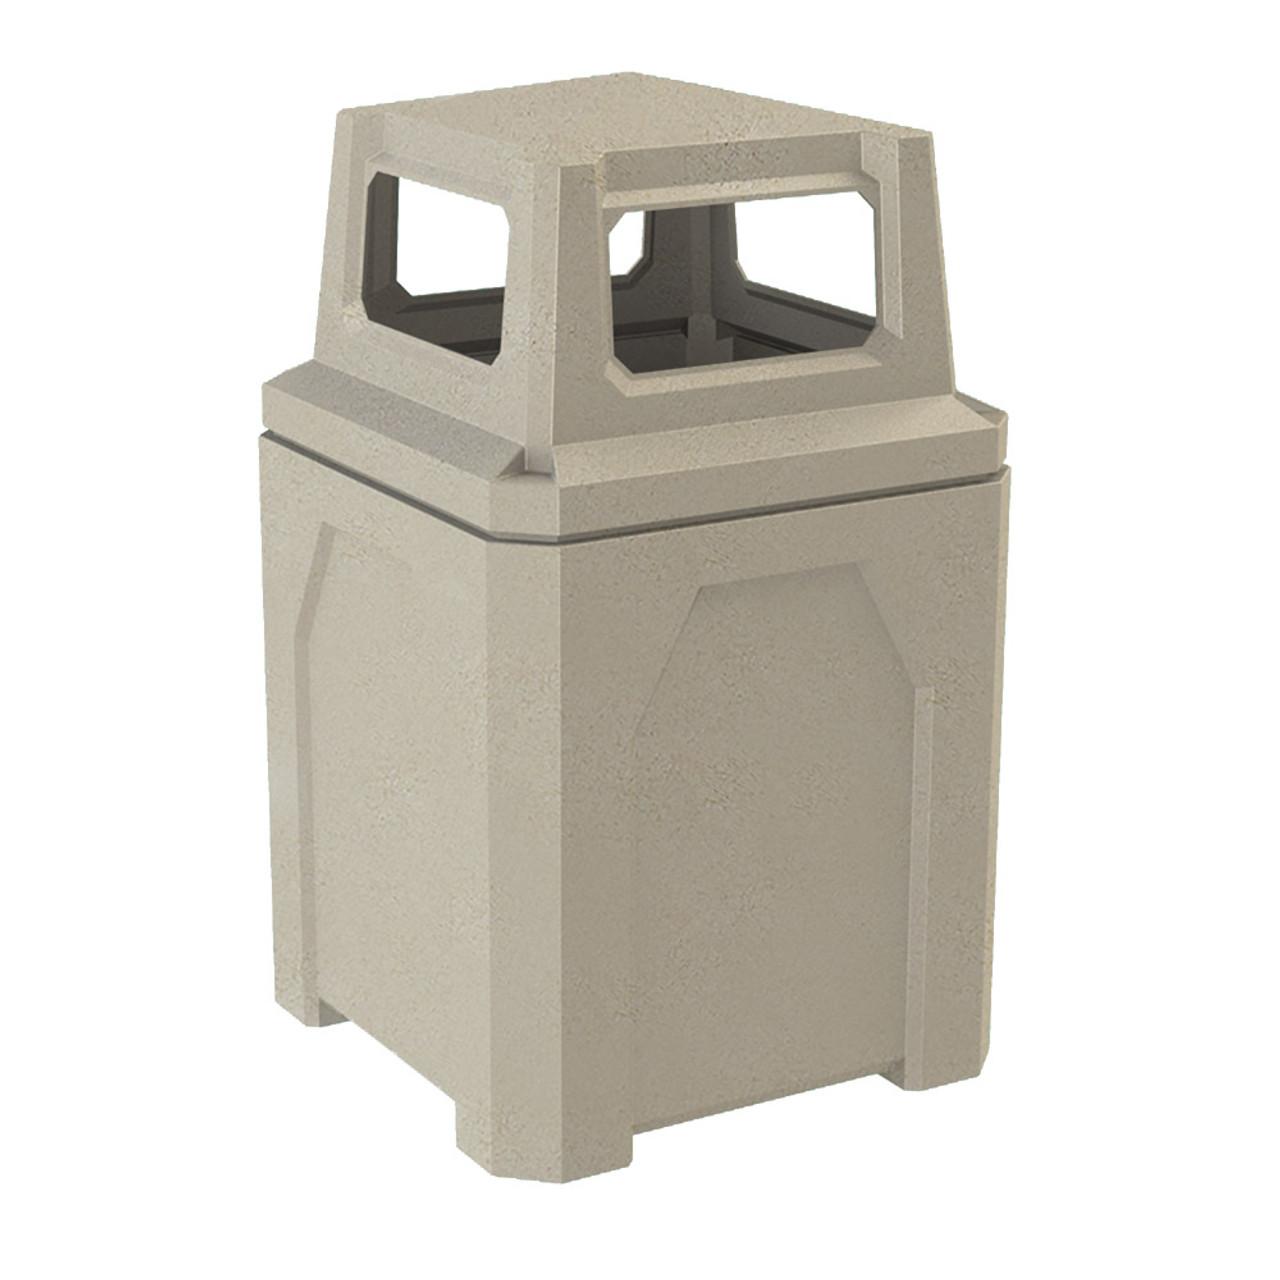 52 Gallon Kolor Can Square Plastic Outdoor Trash Can S7301A-00 BEIGE GRANITE